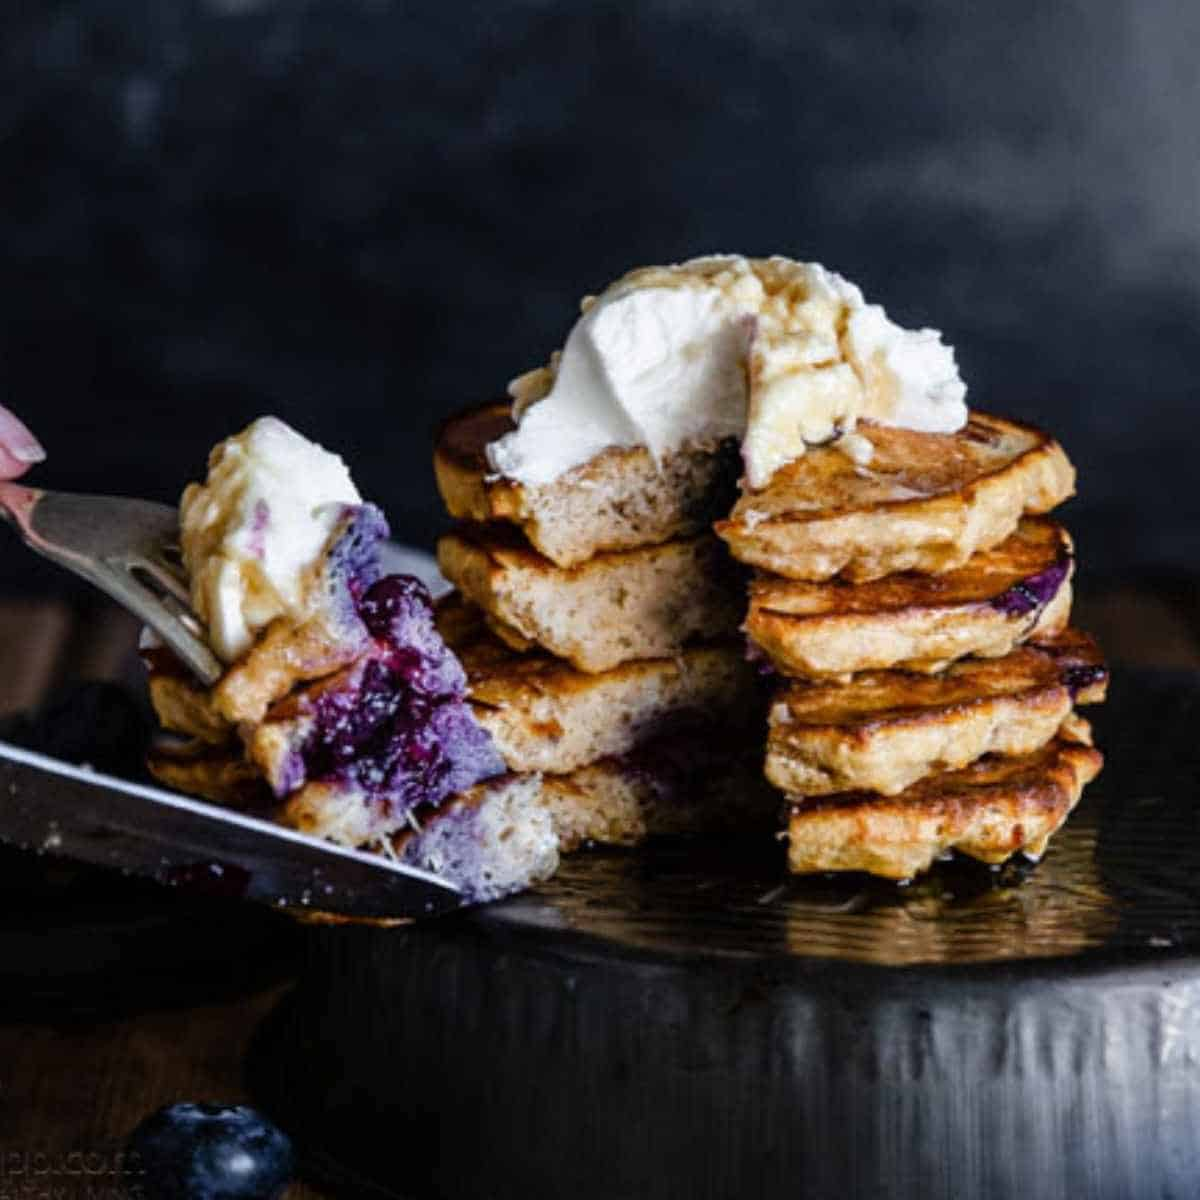 blueberry keto pancakes - Keto Coconut Flour Recipes: Desserts to Dinners